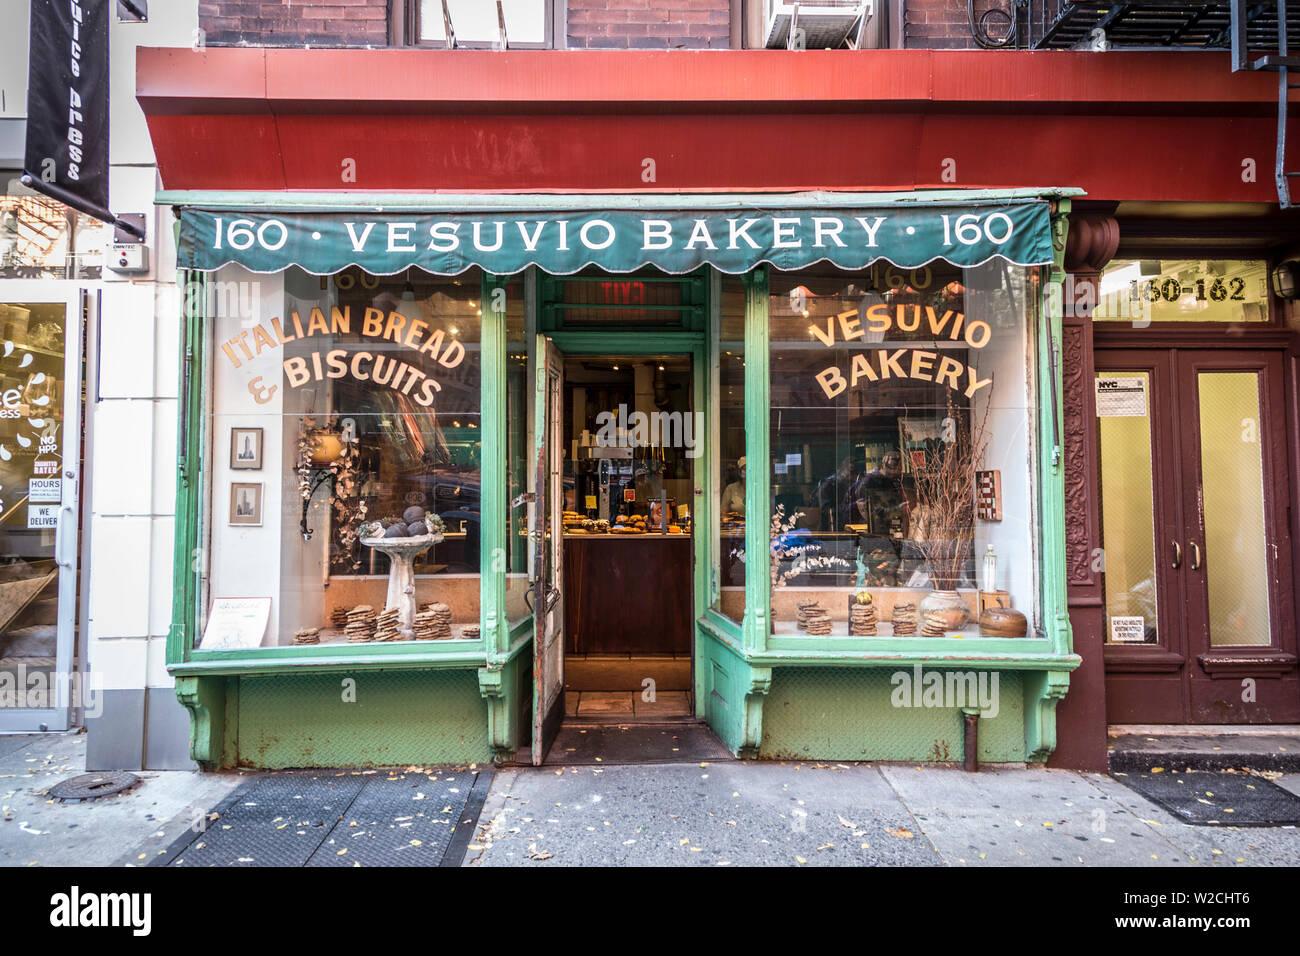 Bakery in Soho, Manhattan, New York City, New York, USA Stock Photo